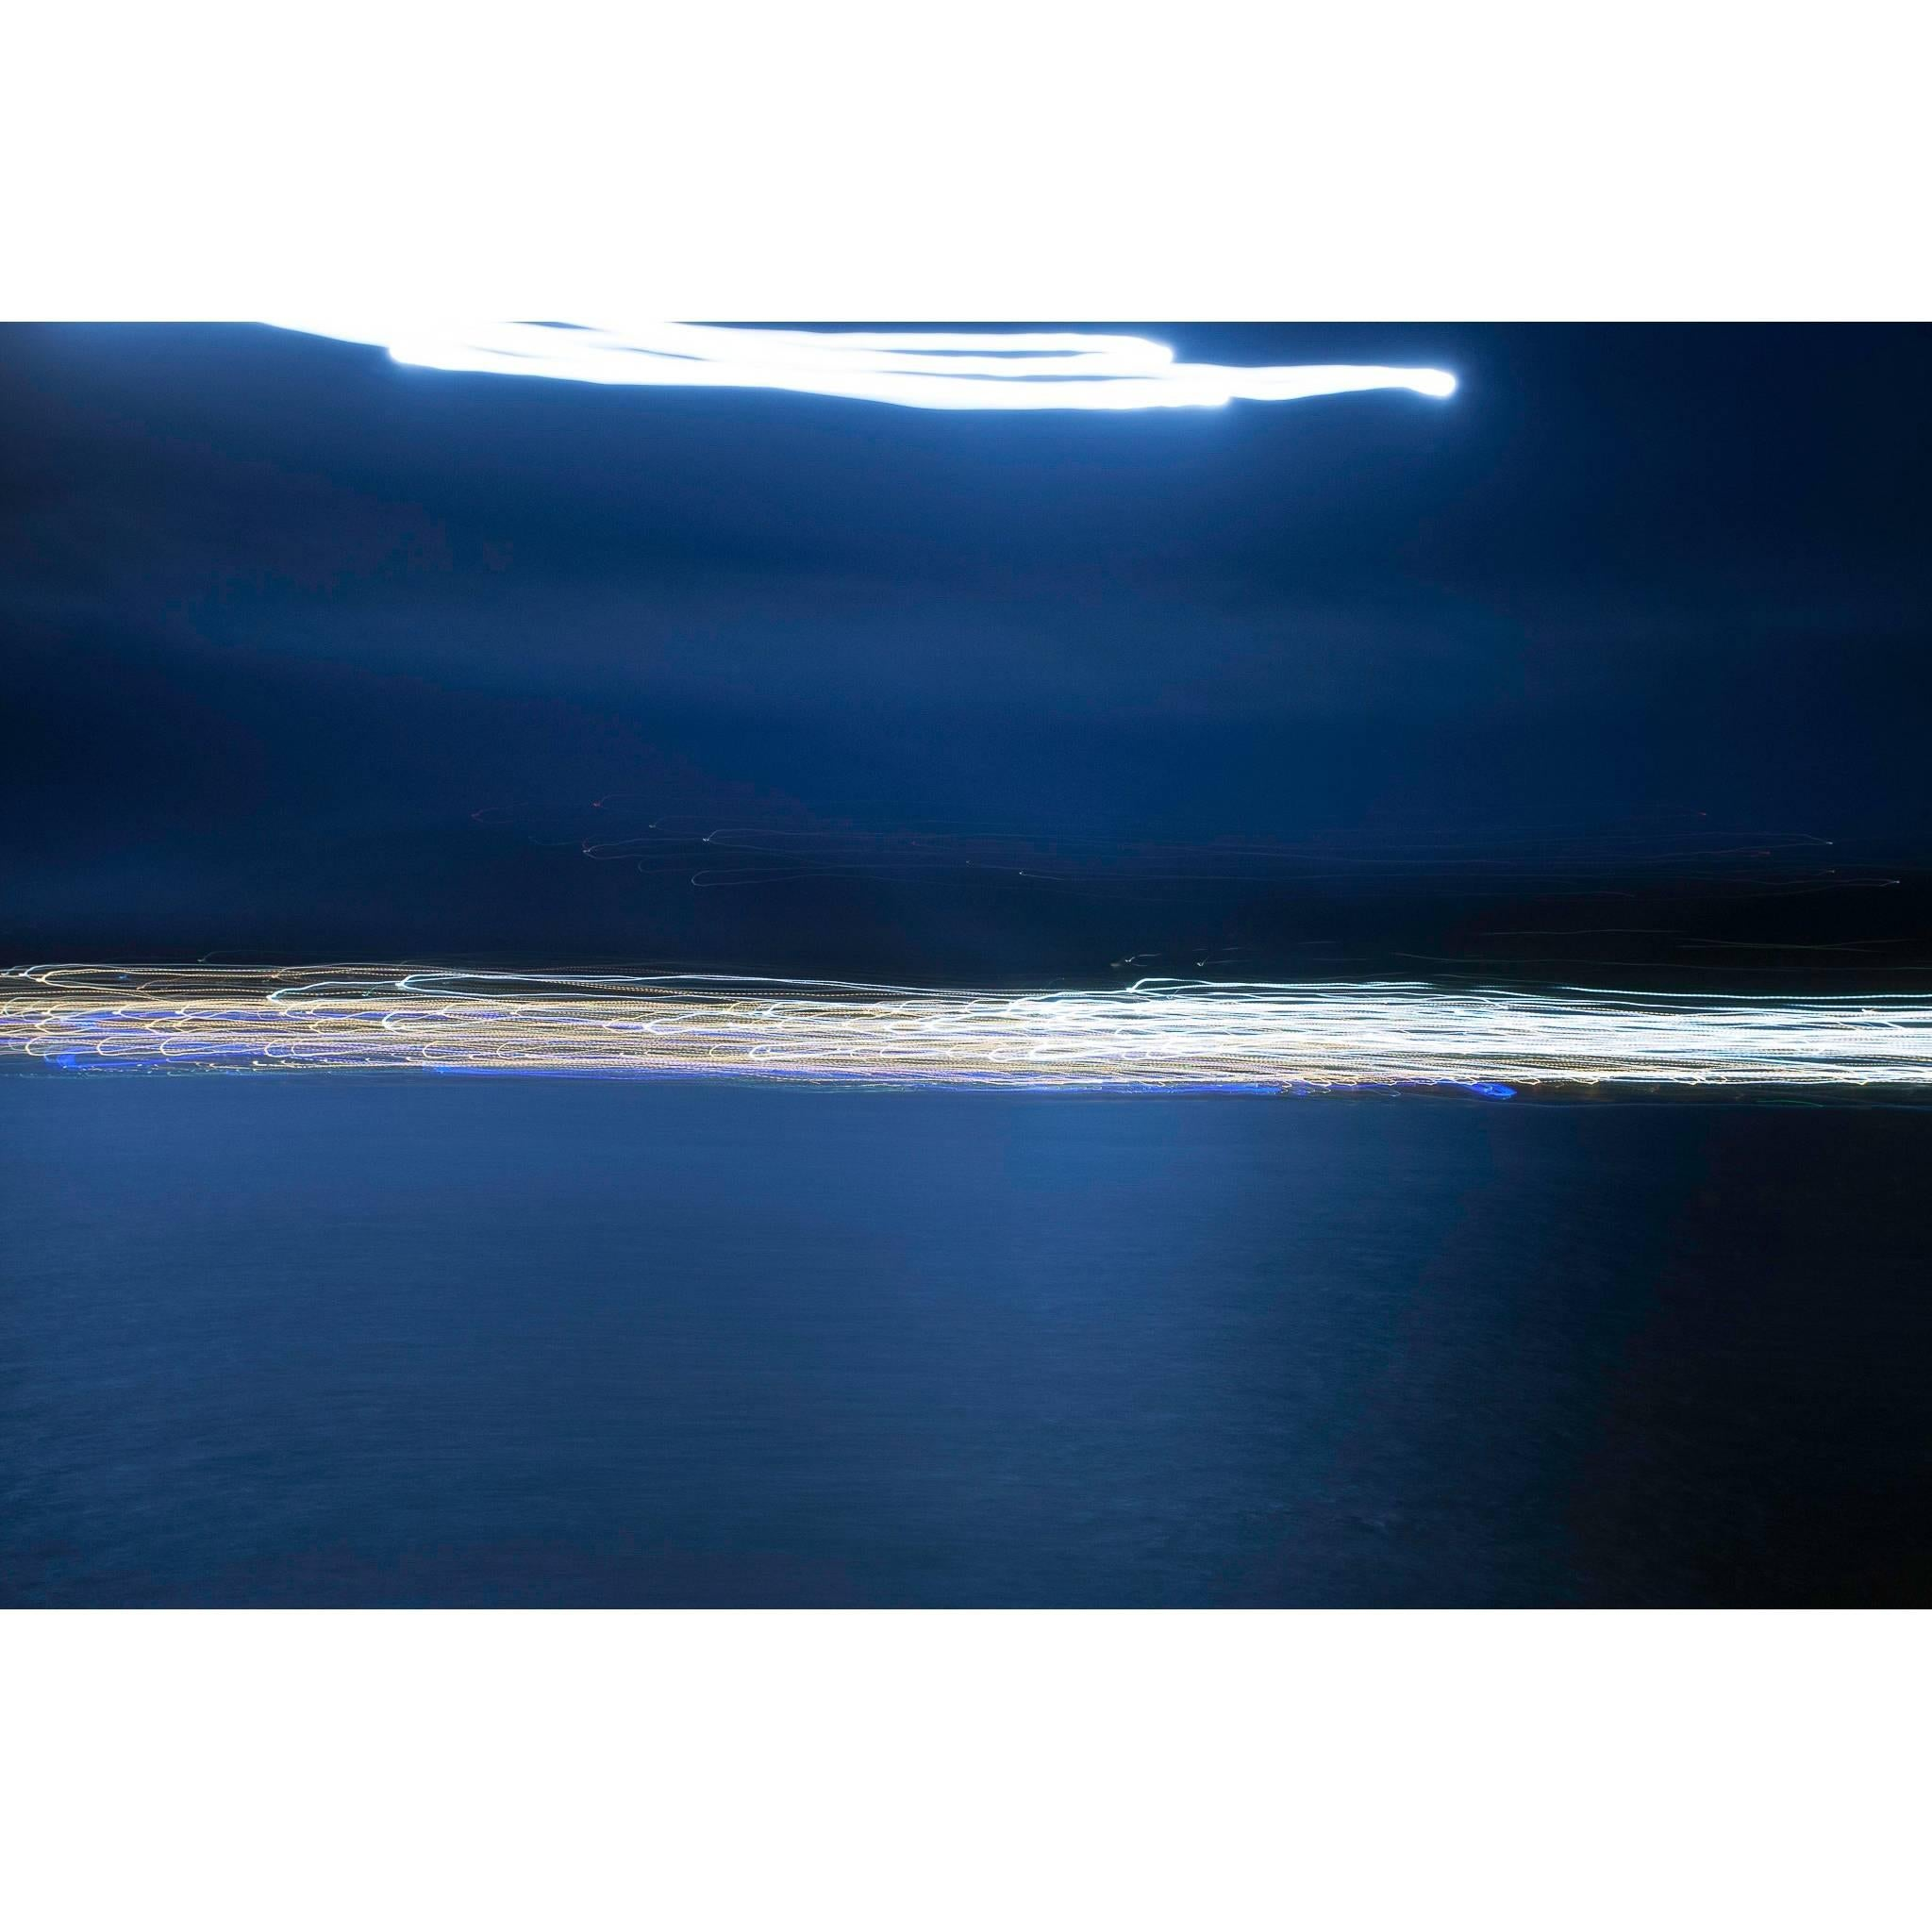 Electric Tartane 2 / Photography